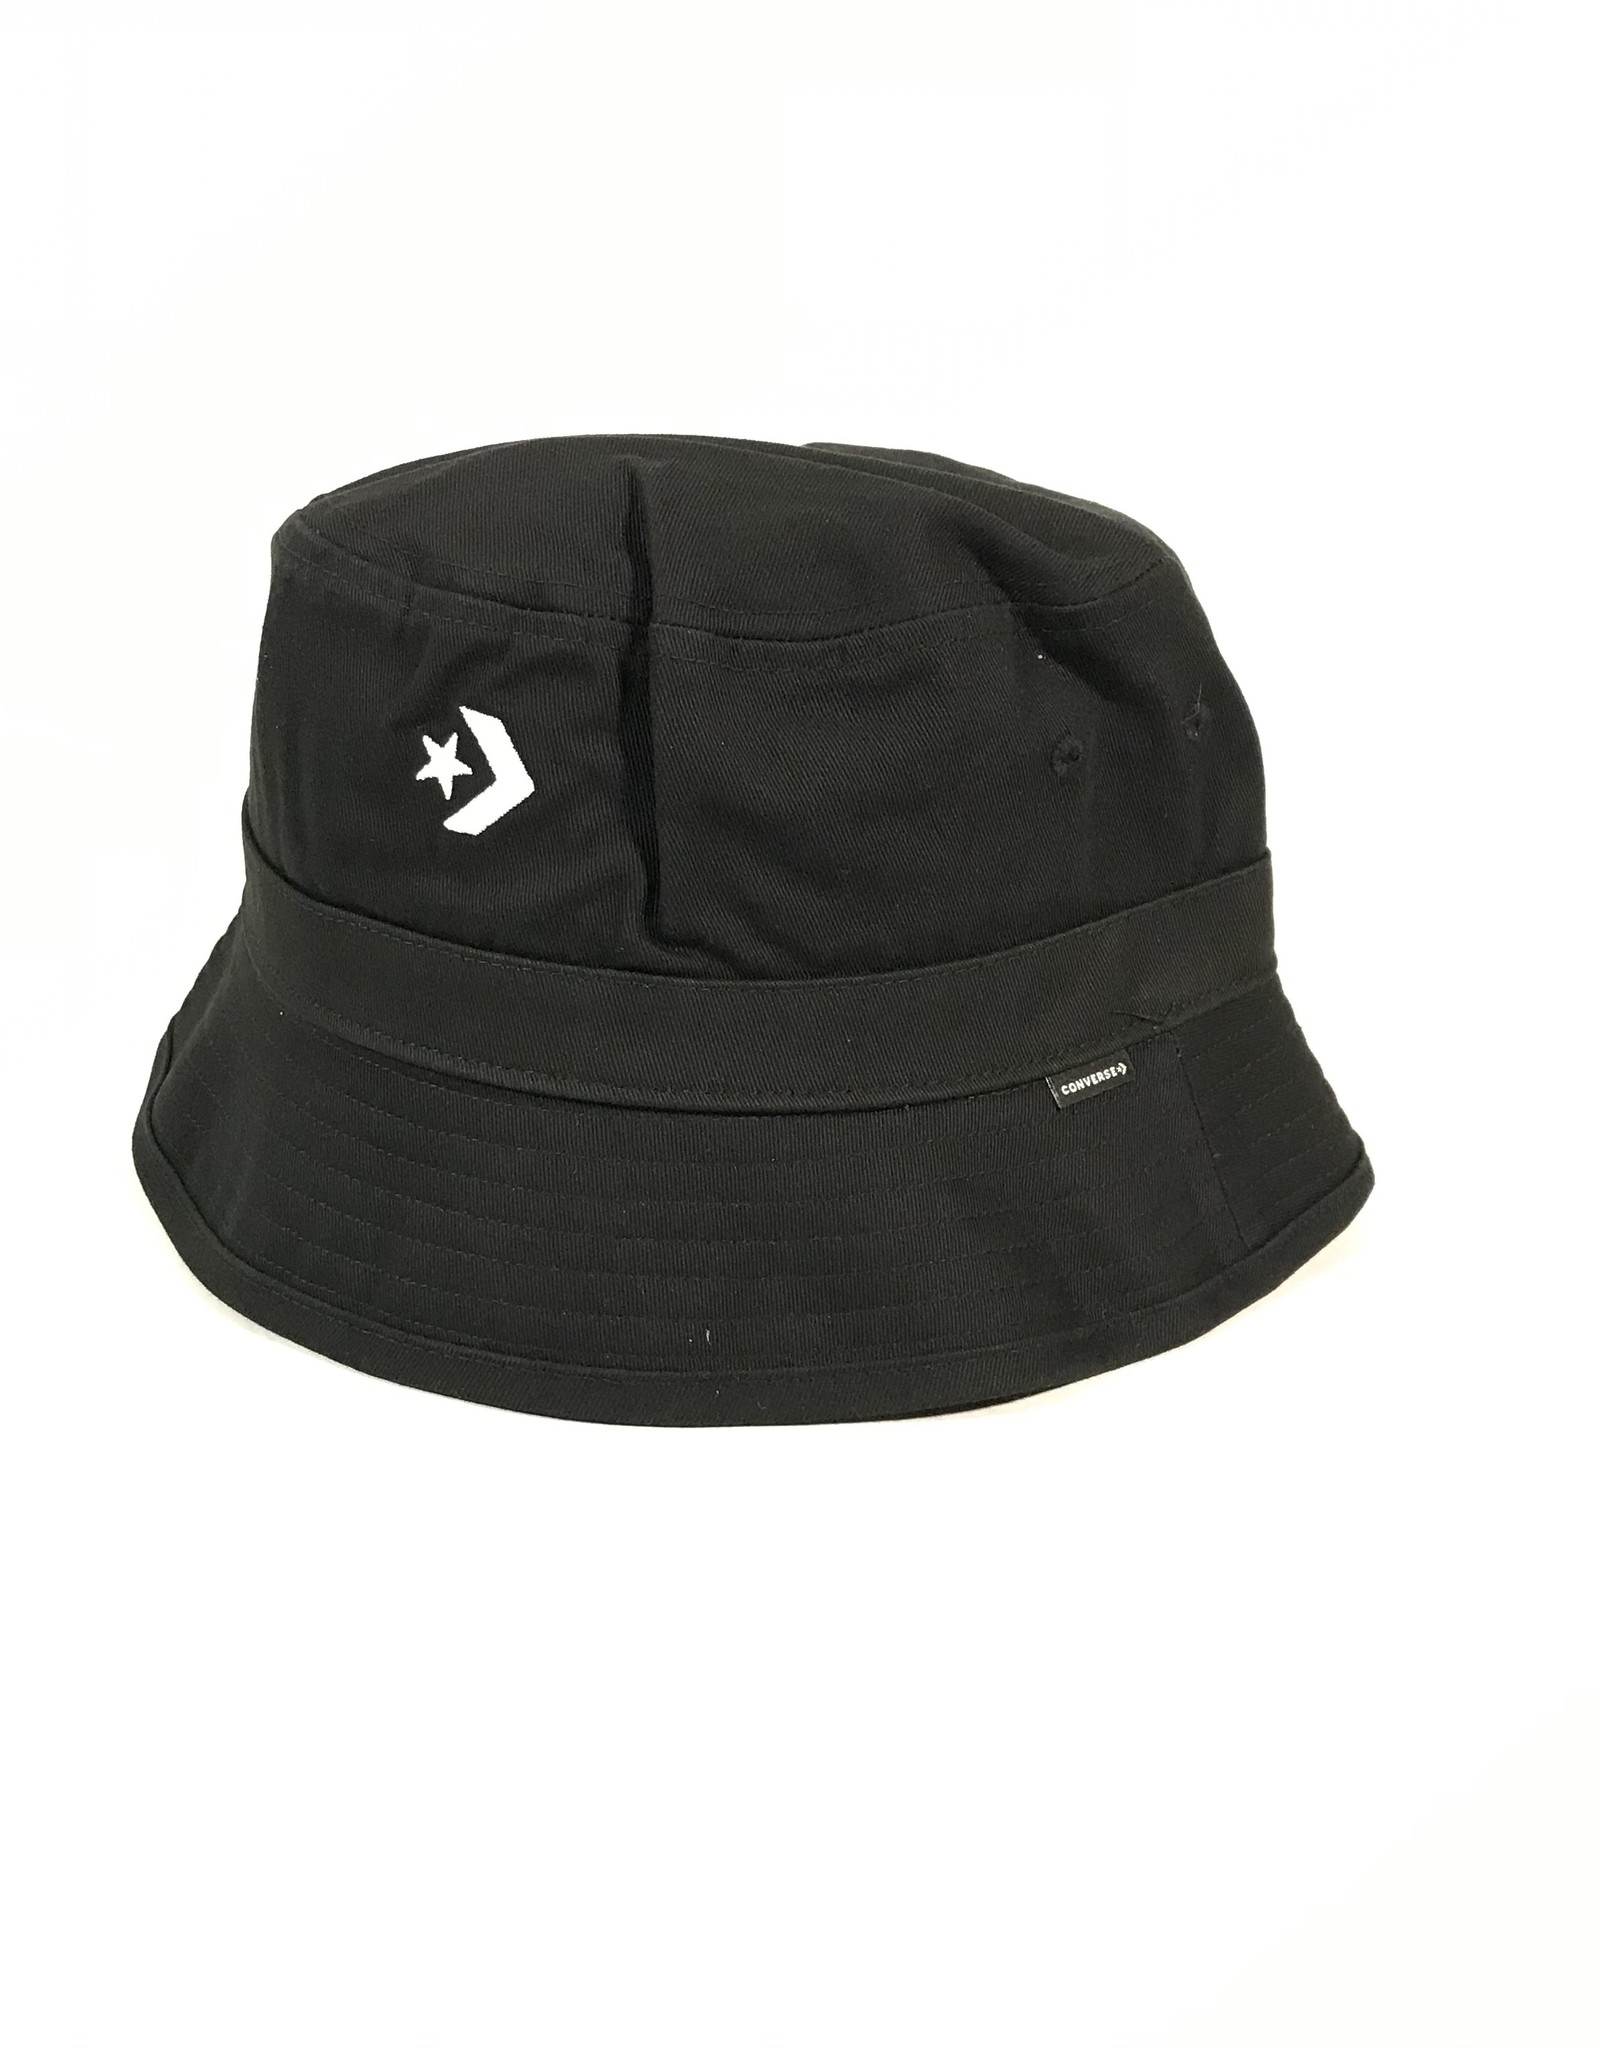 CONVERSE CONVERSE CONS CLASSIC BUCKET HAT - BLACK